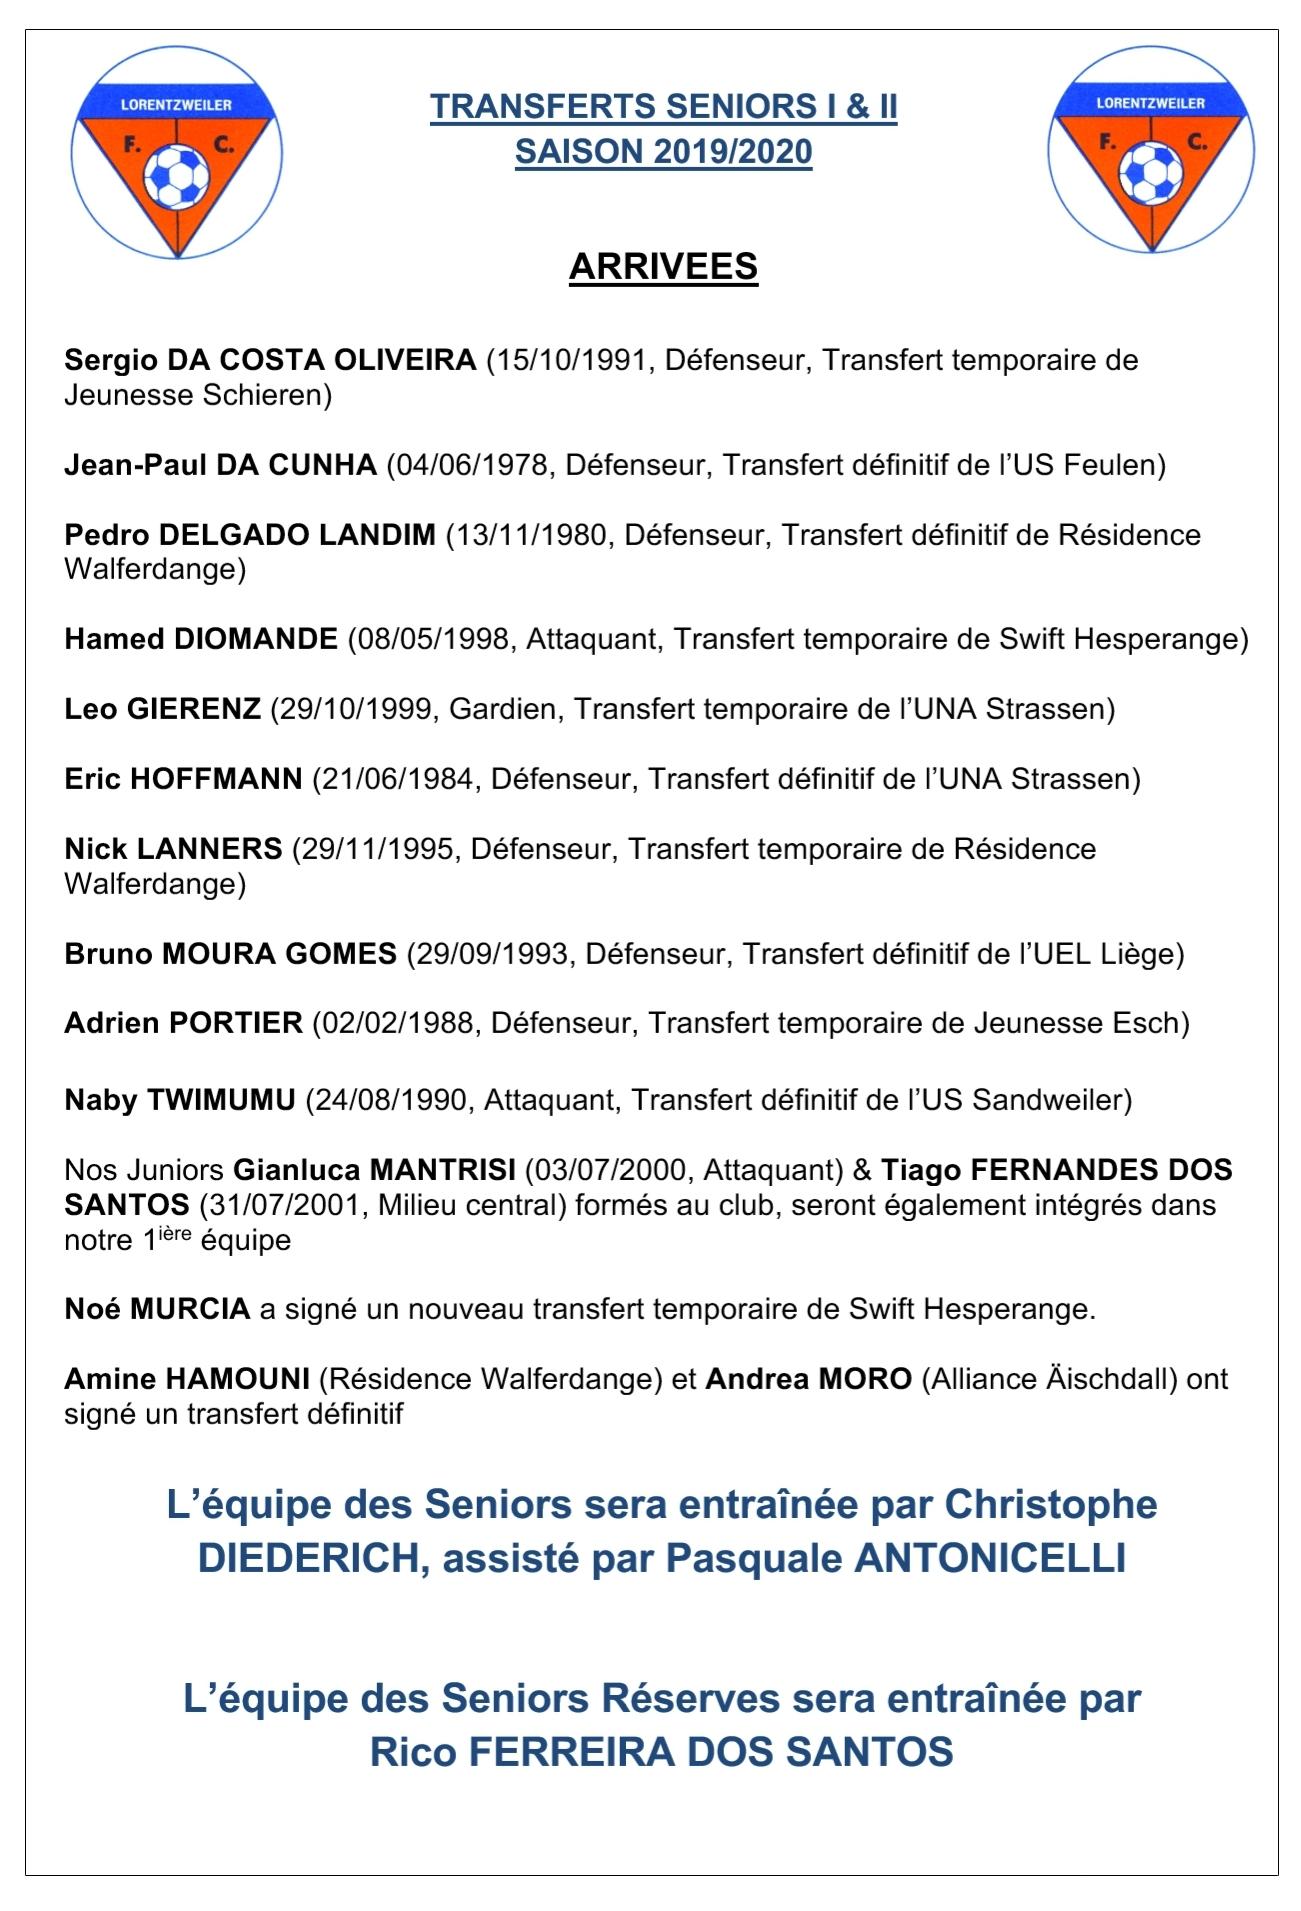 Transferts Seniors - Saison 2019/2020